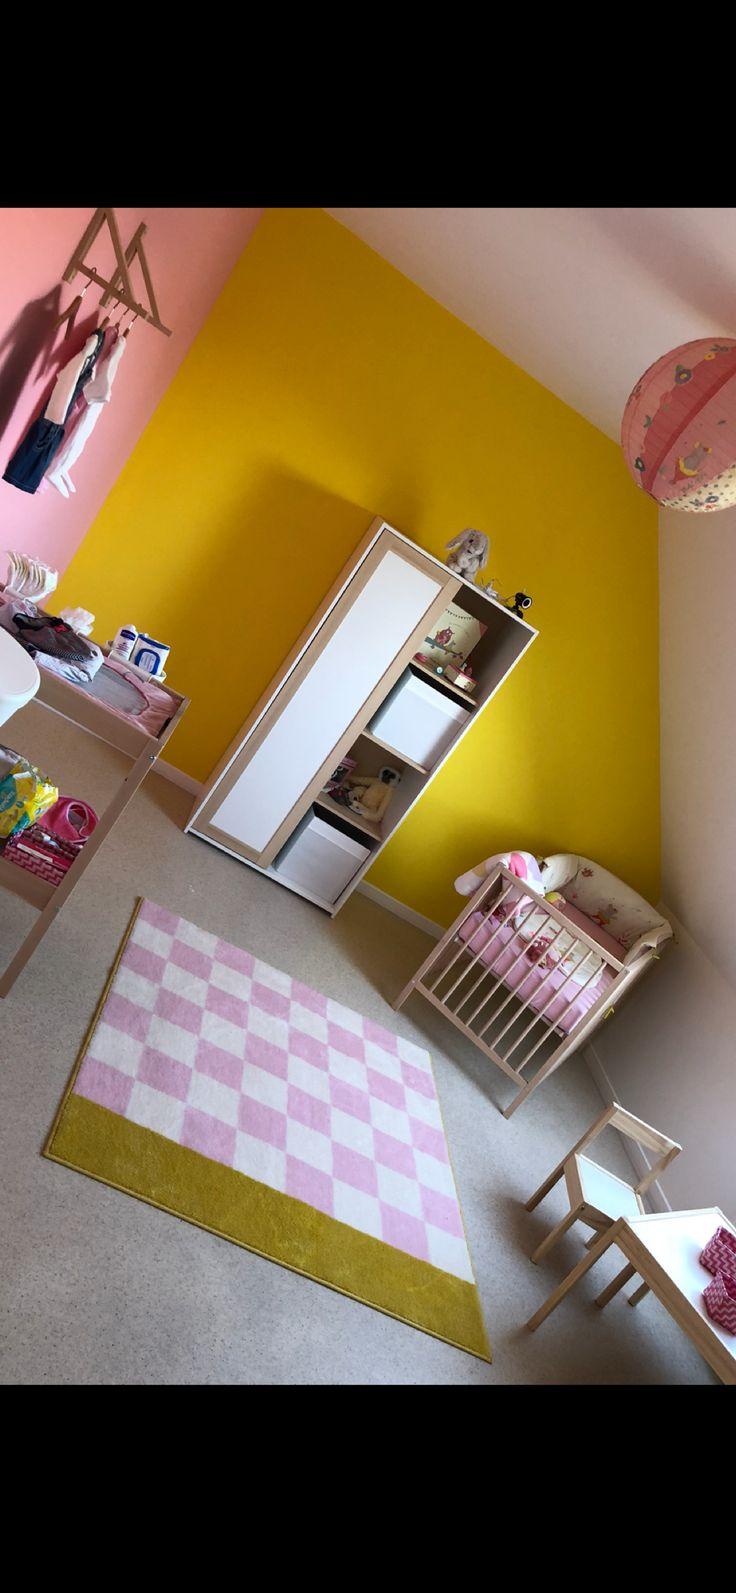 Chambre fille #ikea #sniglar #moulinroty #jaune #rose